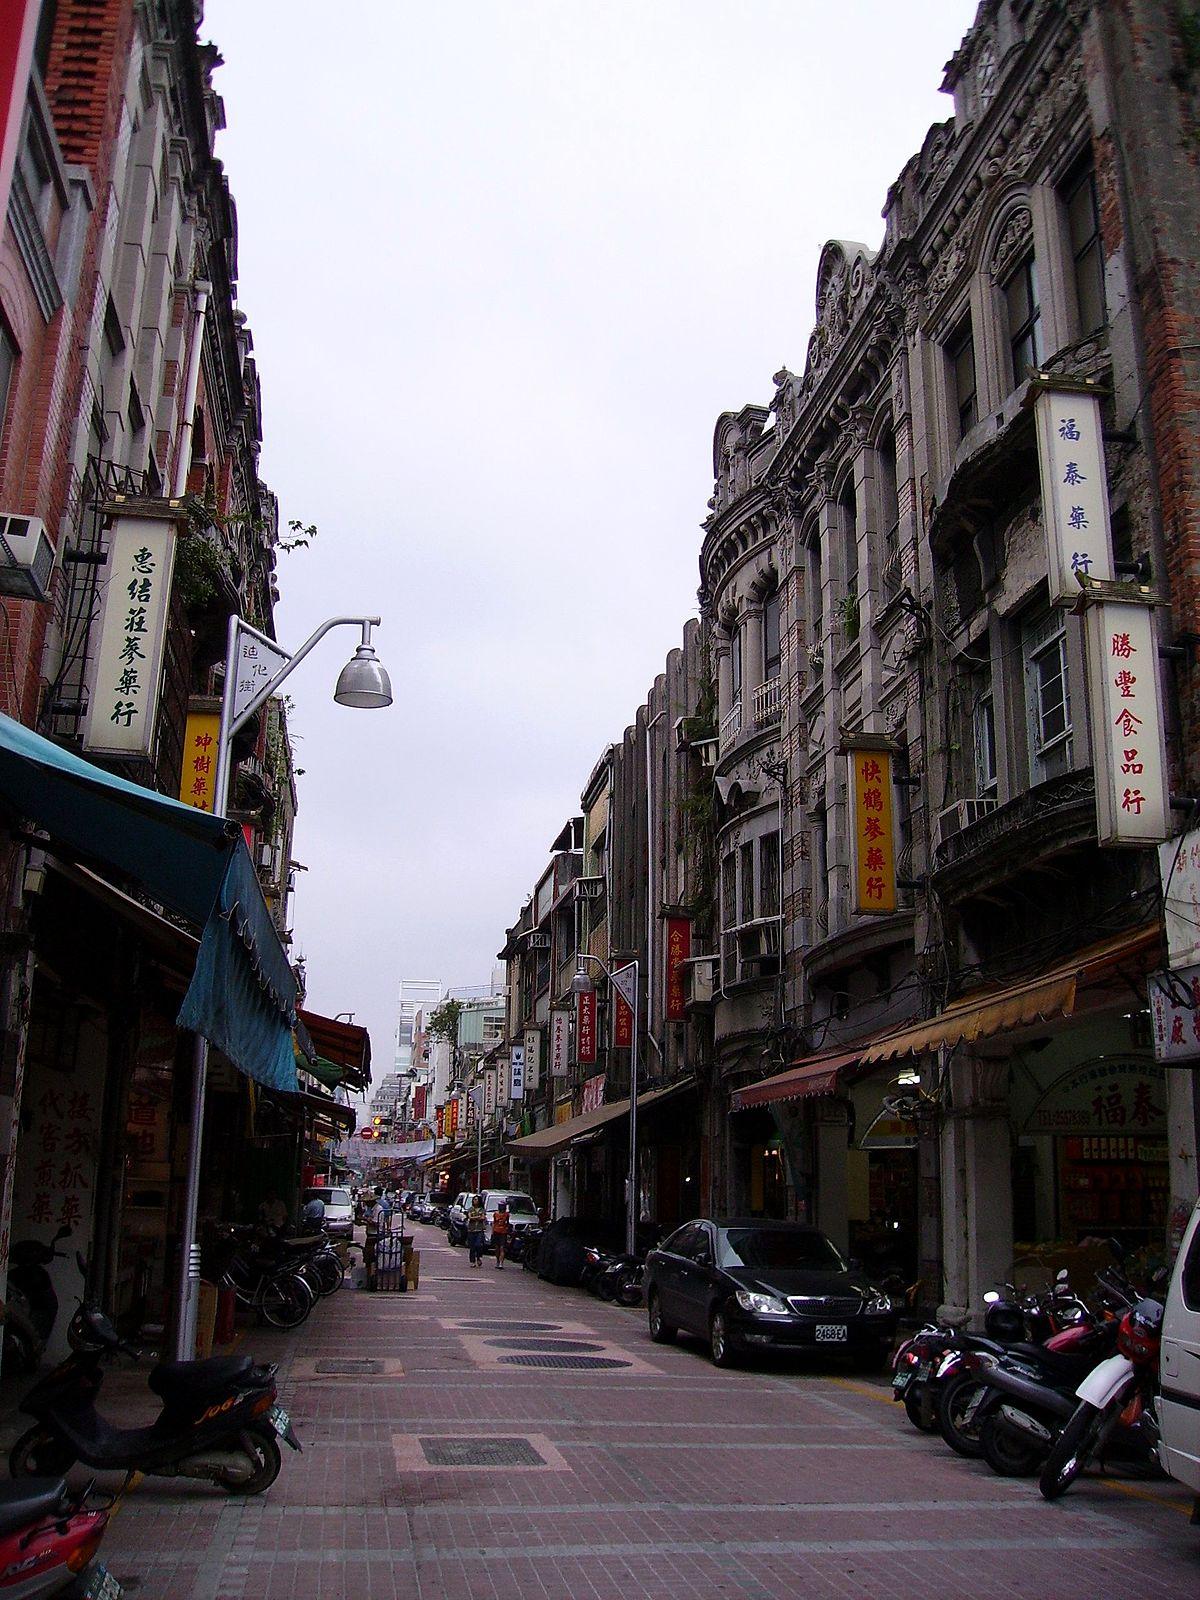 street dihua taipei taiwan wikipedia commons cruisebe